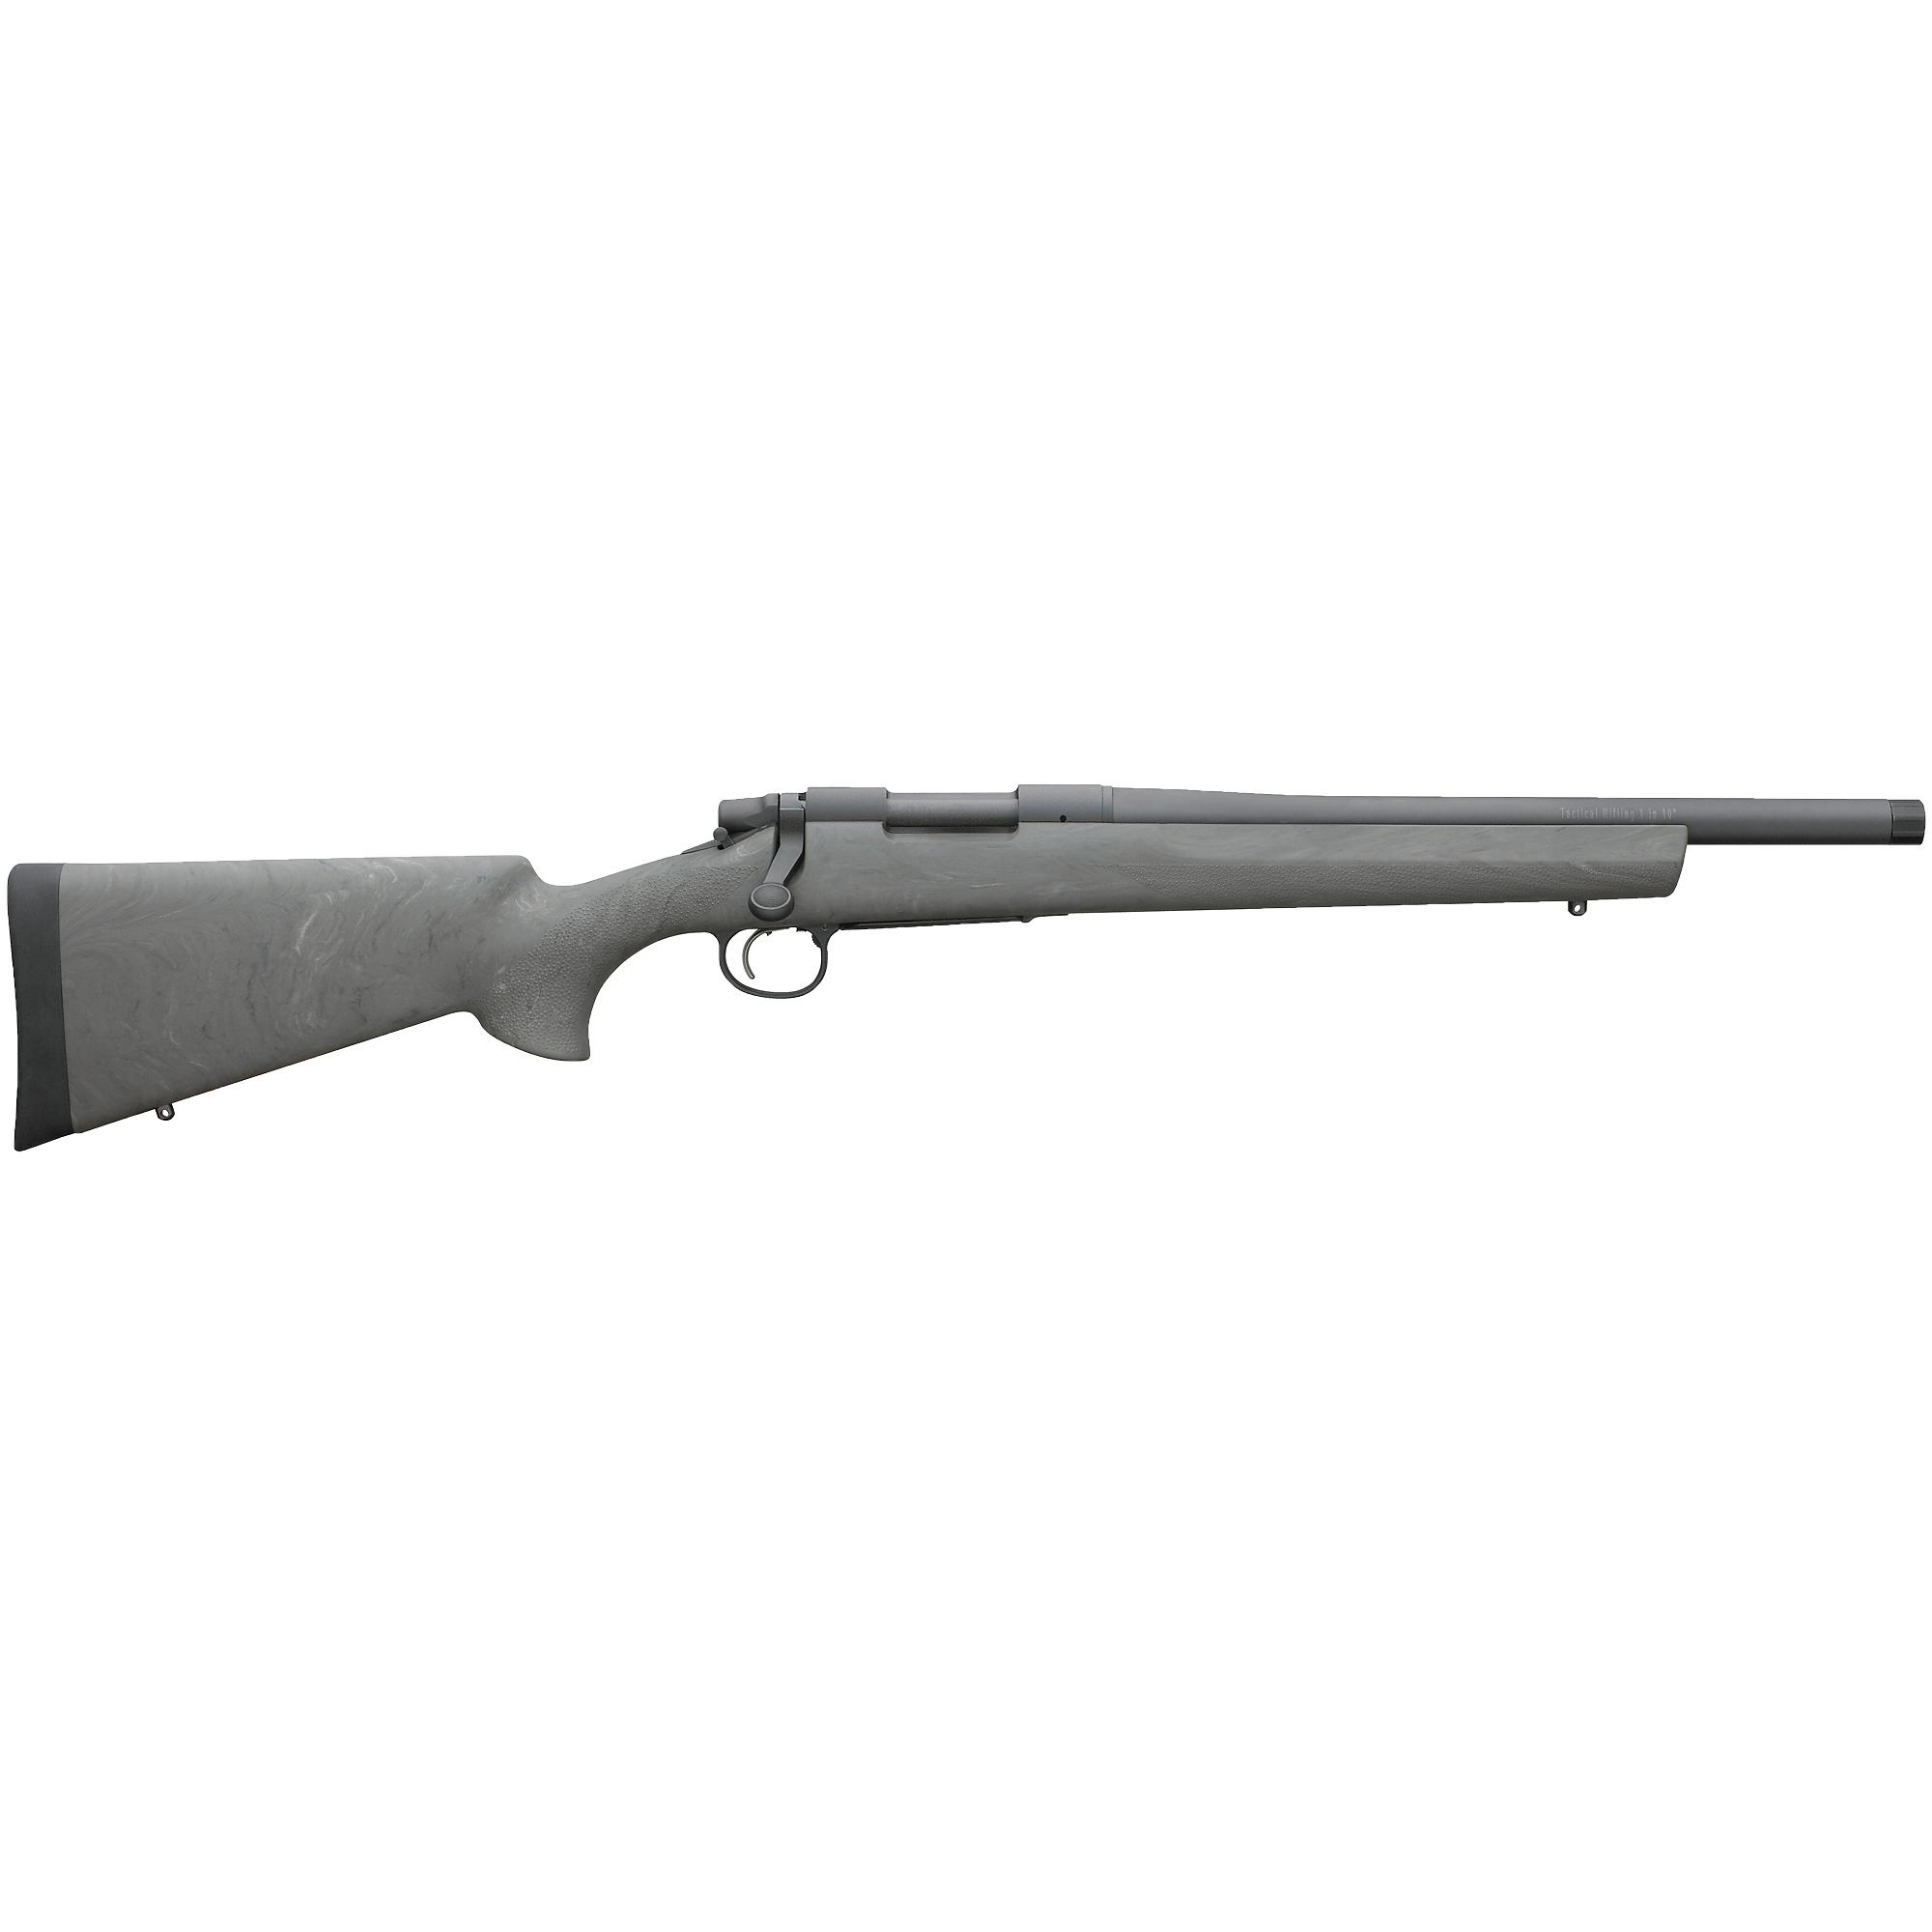 Remington Model 700 SPS Tactical Centerfire Rifle, .223 Rem, Ghillie Green thumbnail